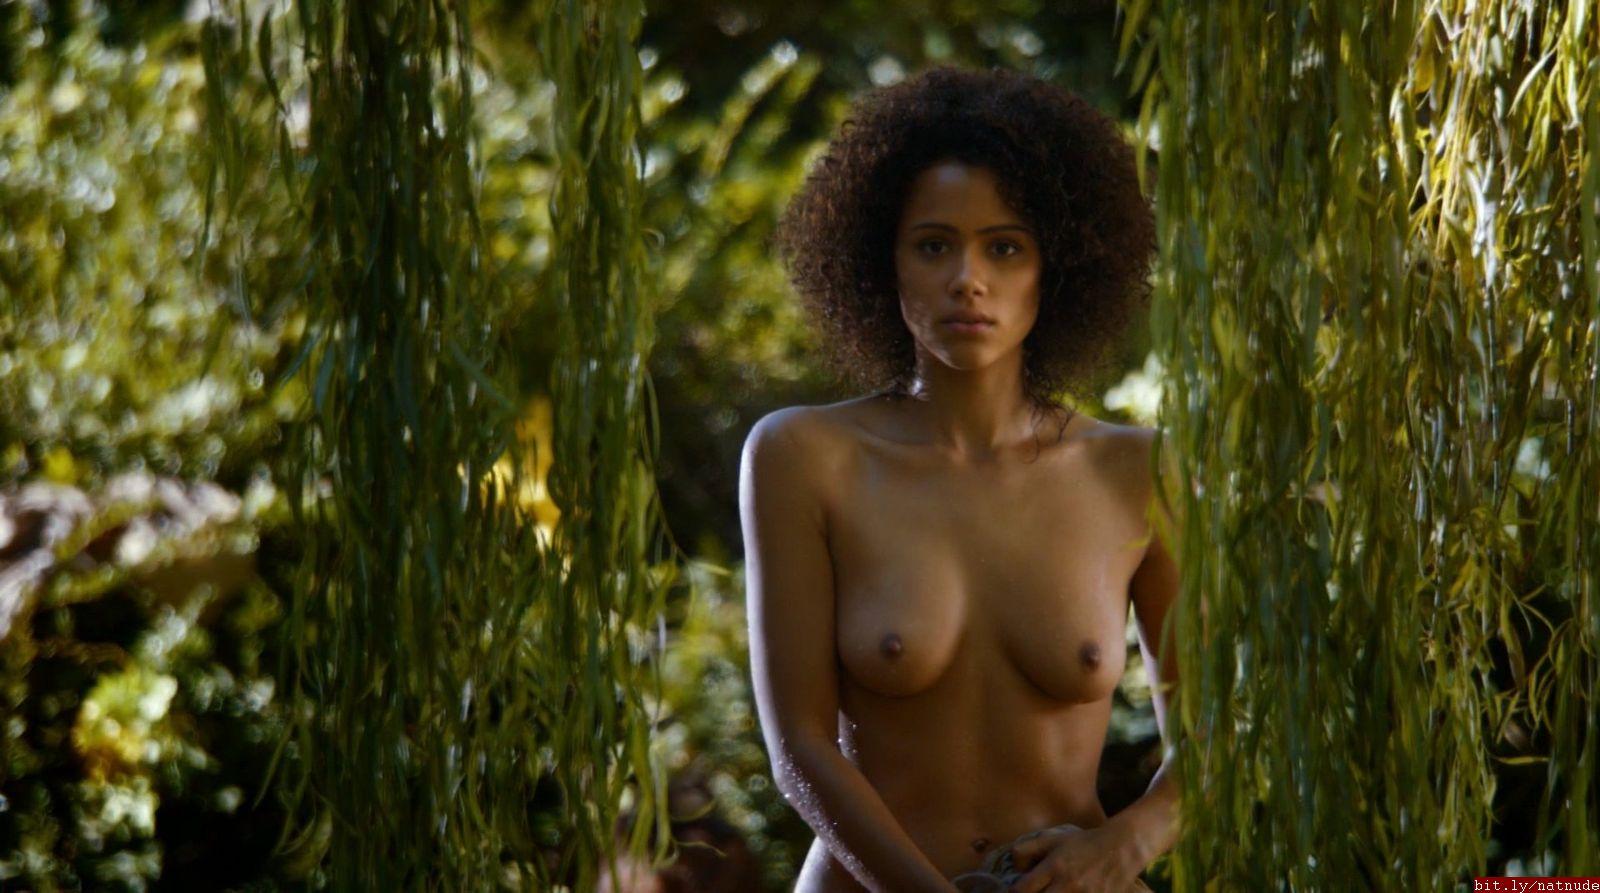 Nathalie Emmanuel desnuda coño